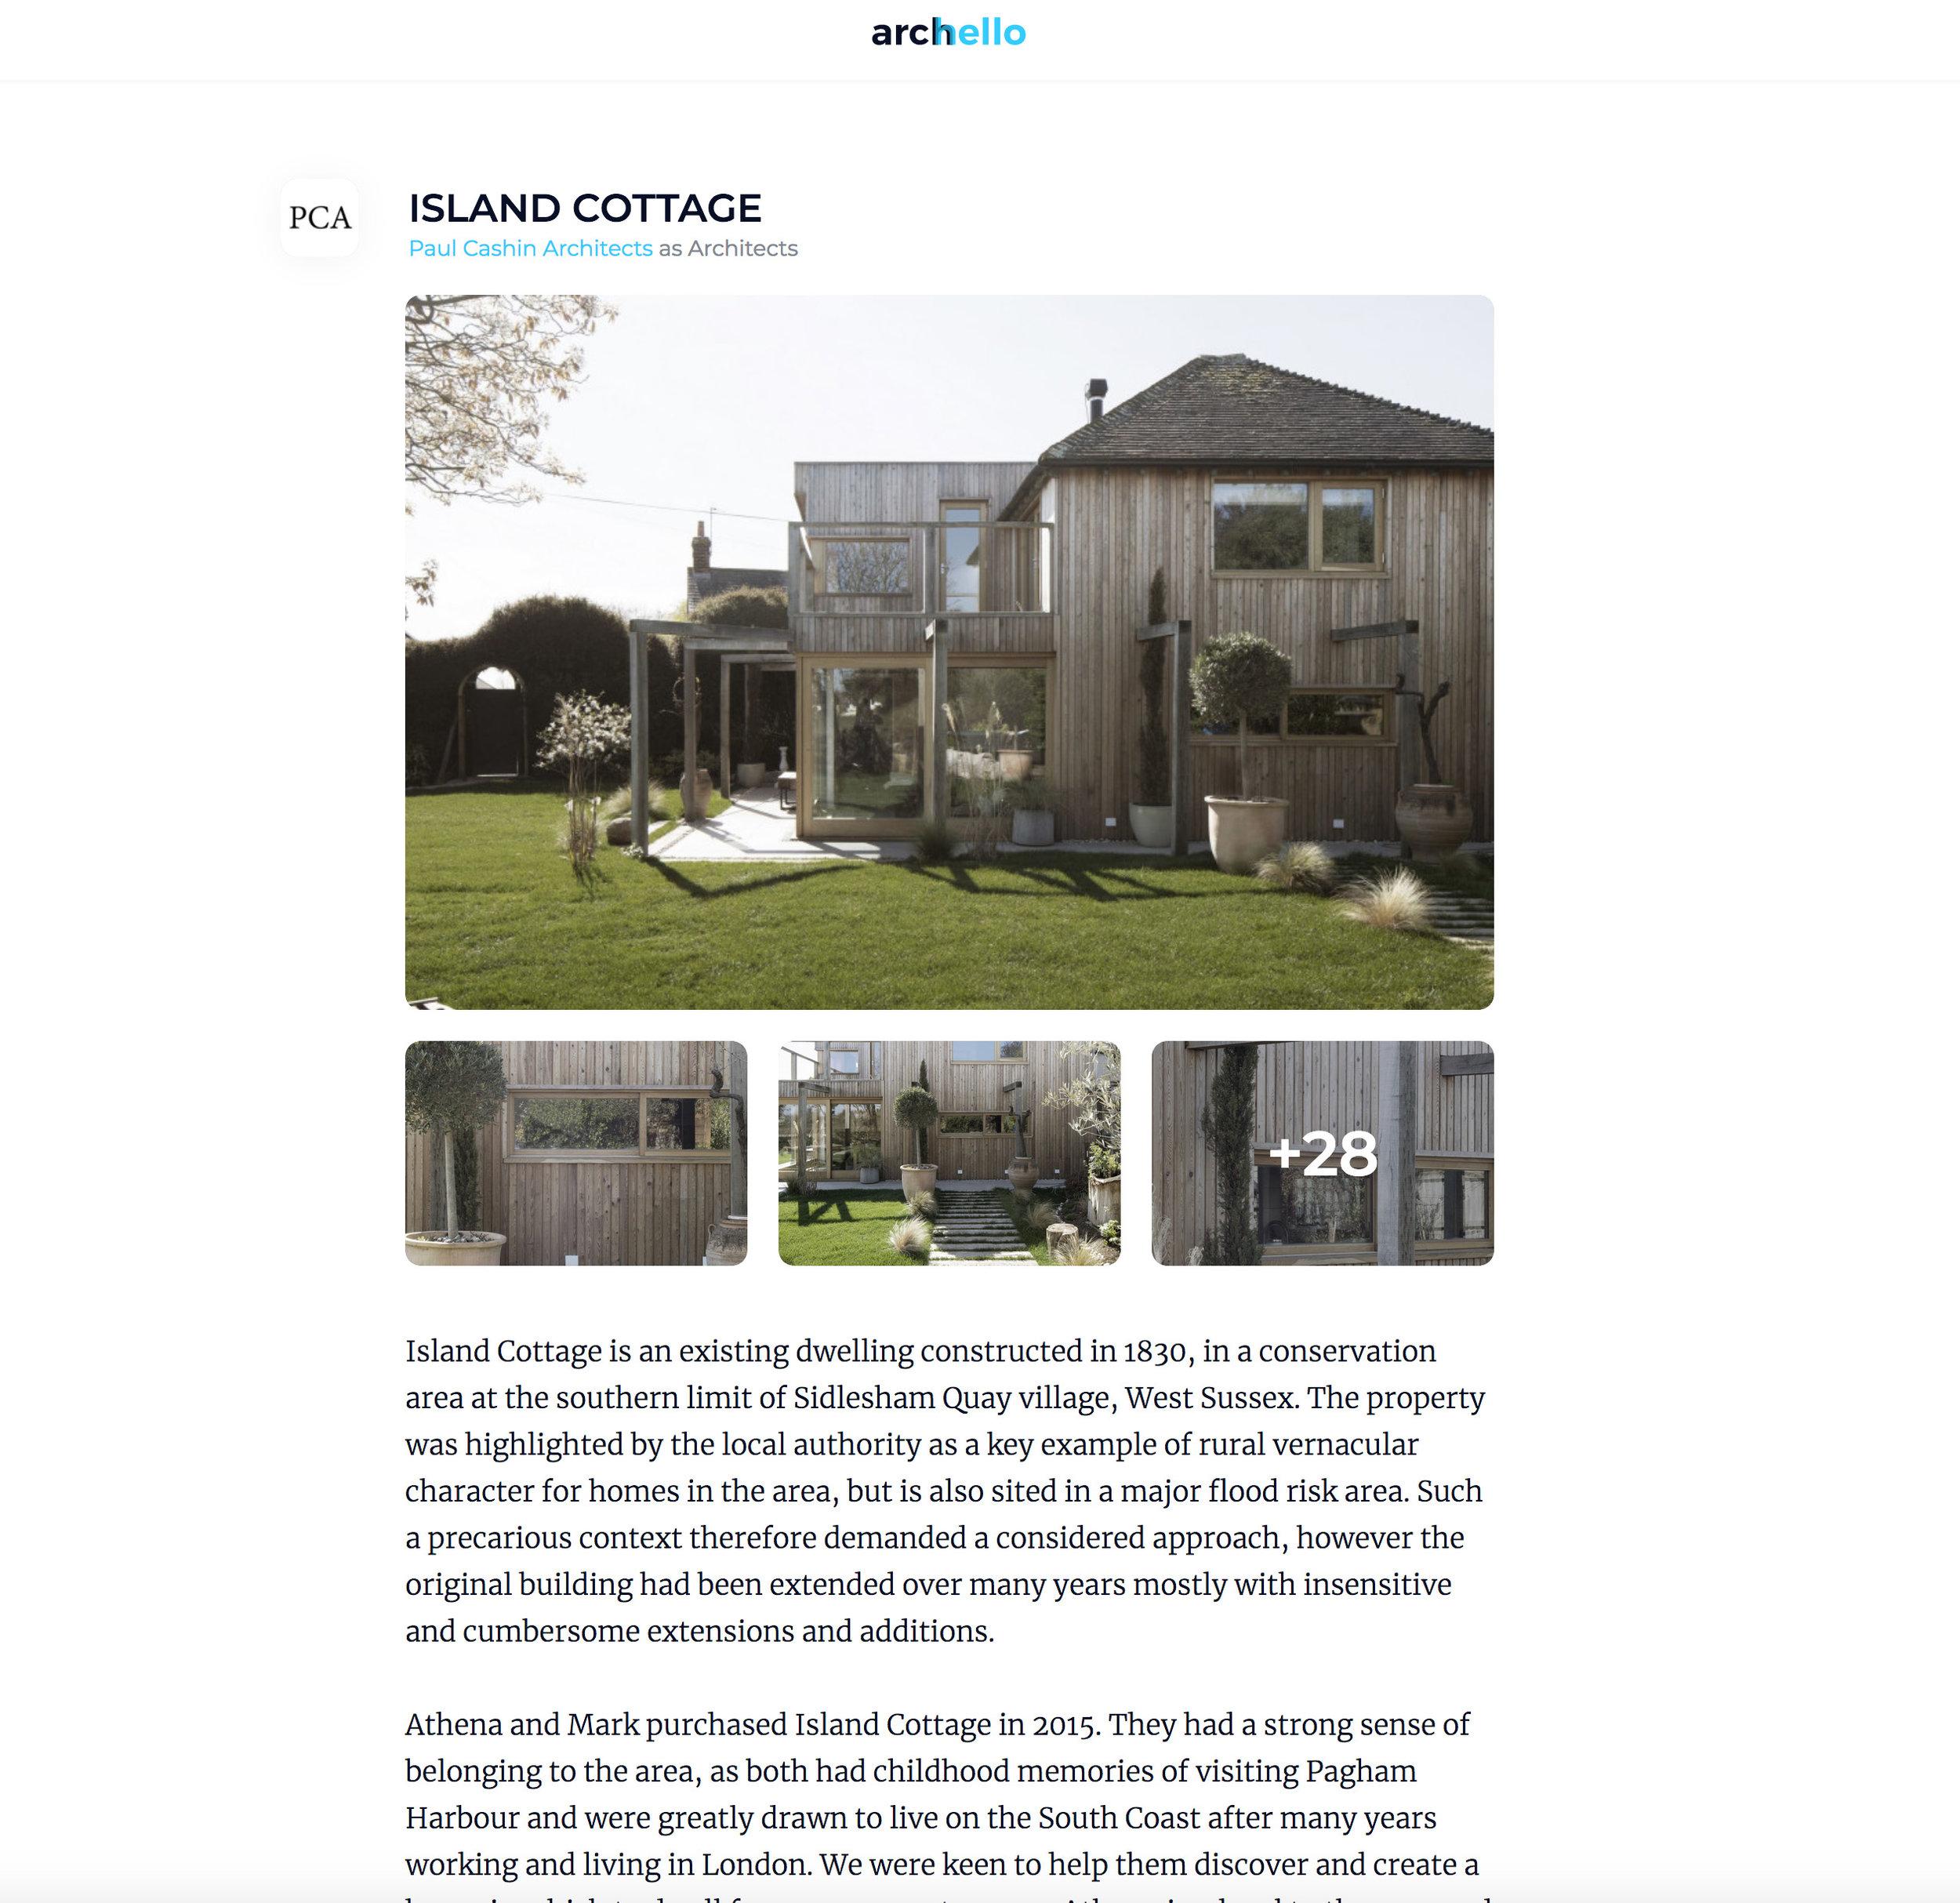 Island Cottage featured in Archello